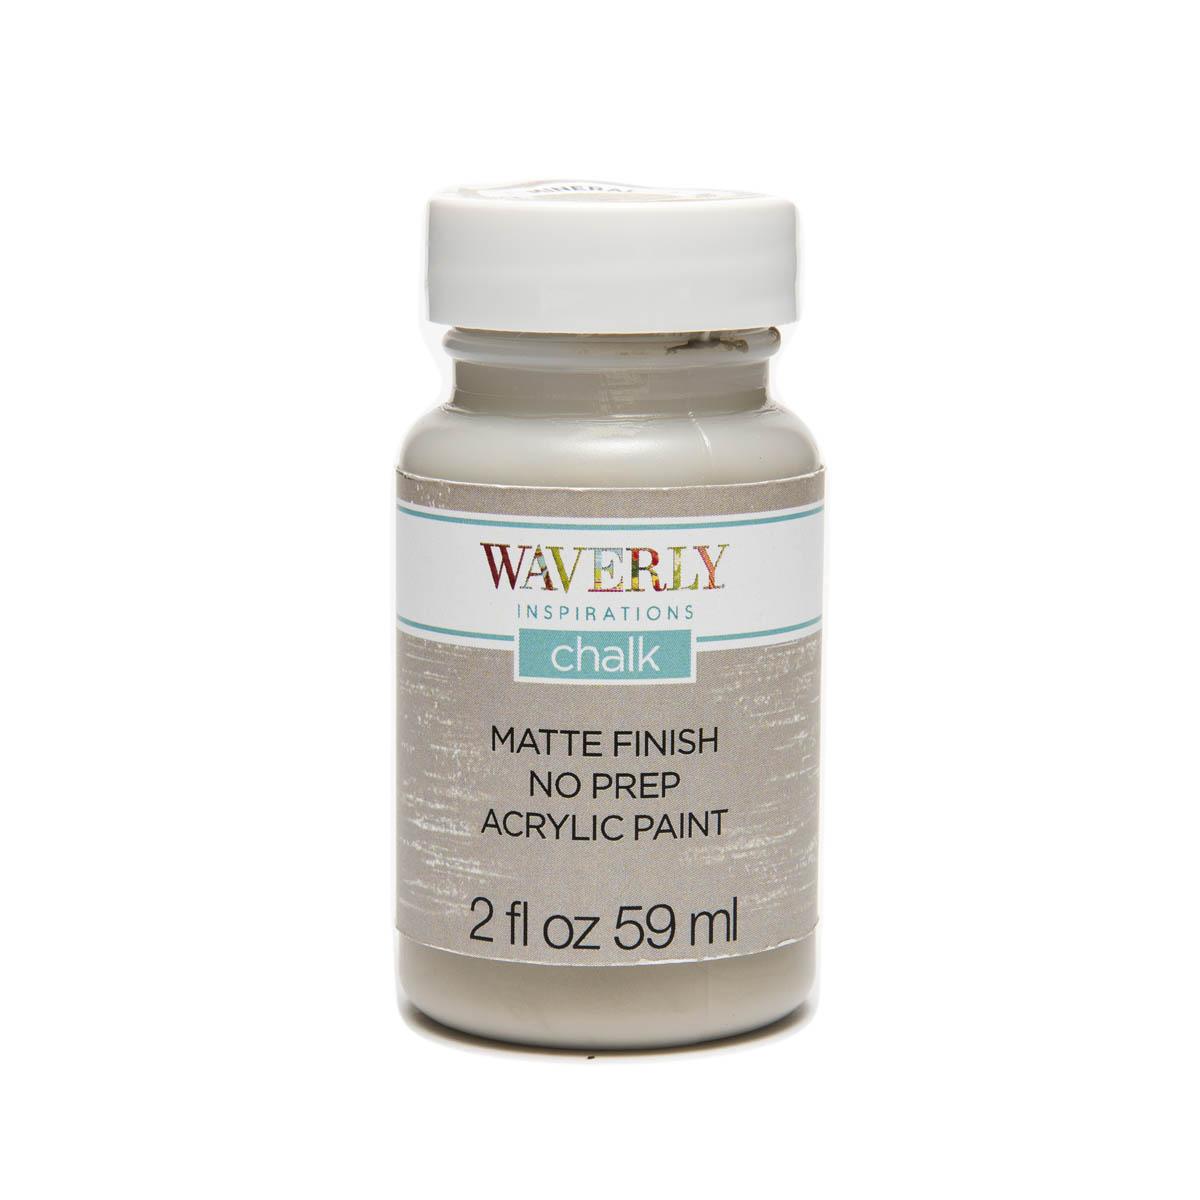 Waverly ® Inspirations Chalk Finish Acrylic Paint - Mineral, 2 oz.